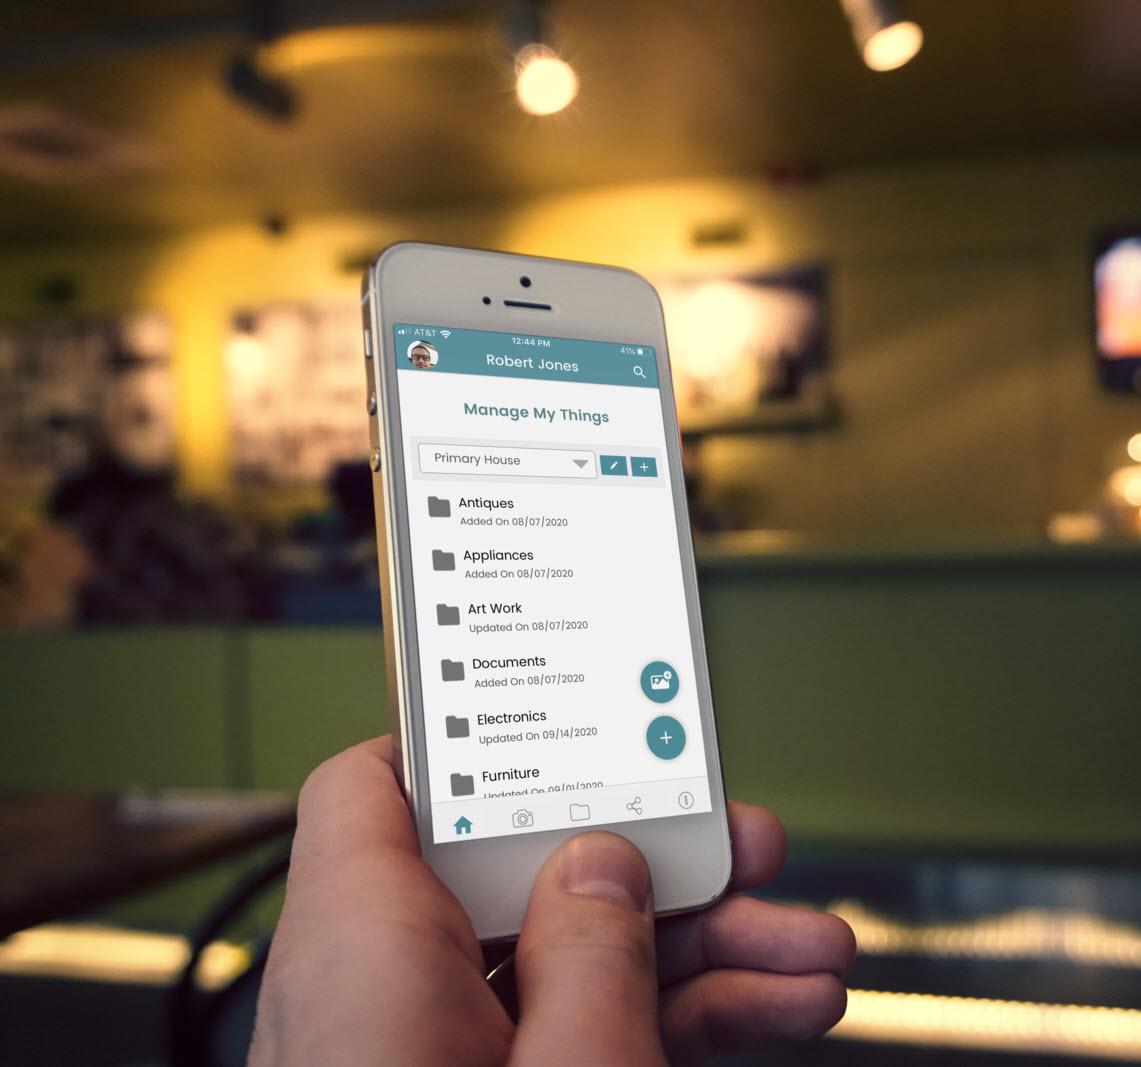 Custom App Development: Manage My Things App